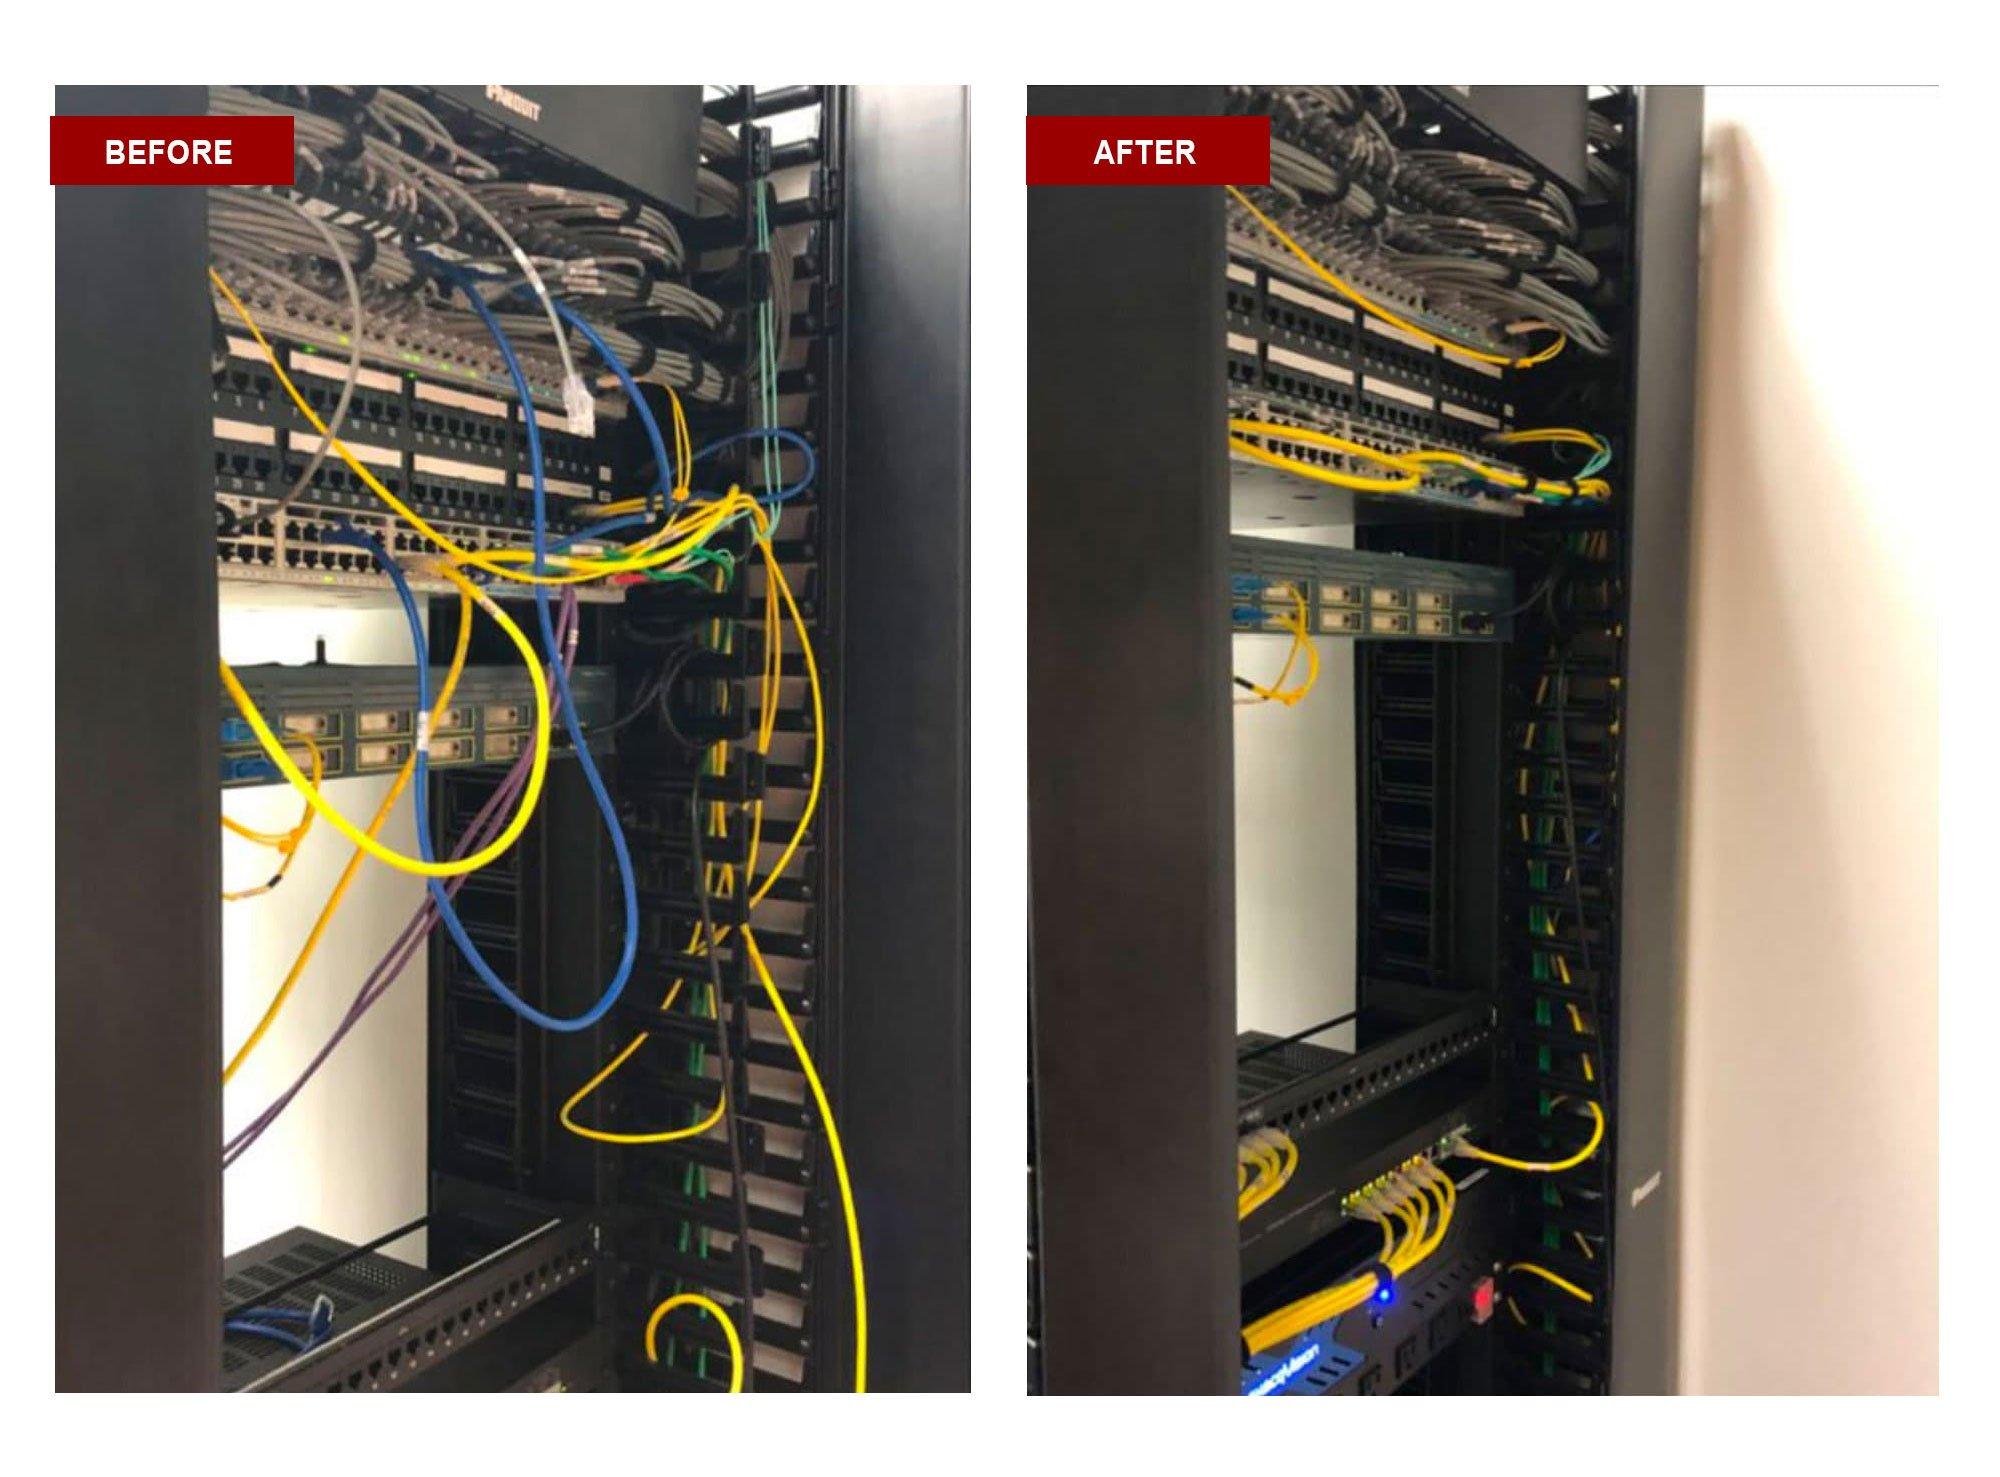 expert network wiring northern illinois